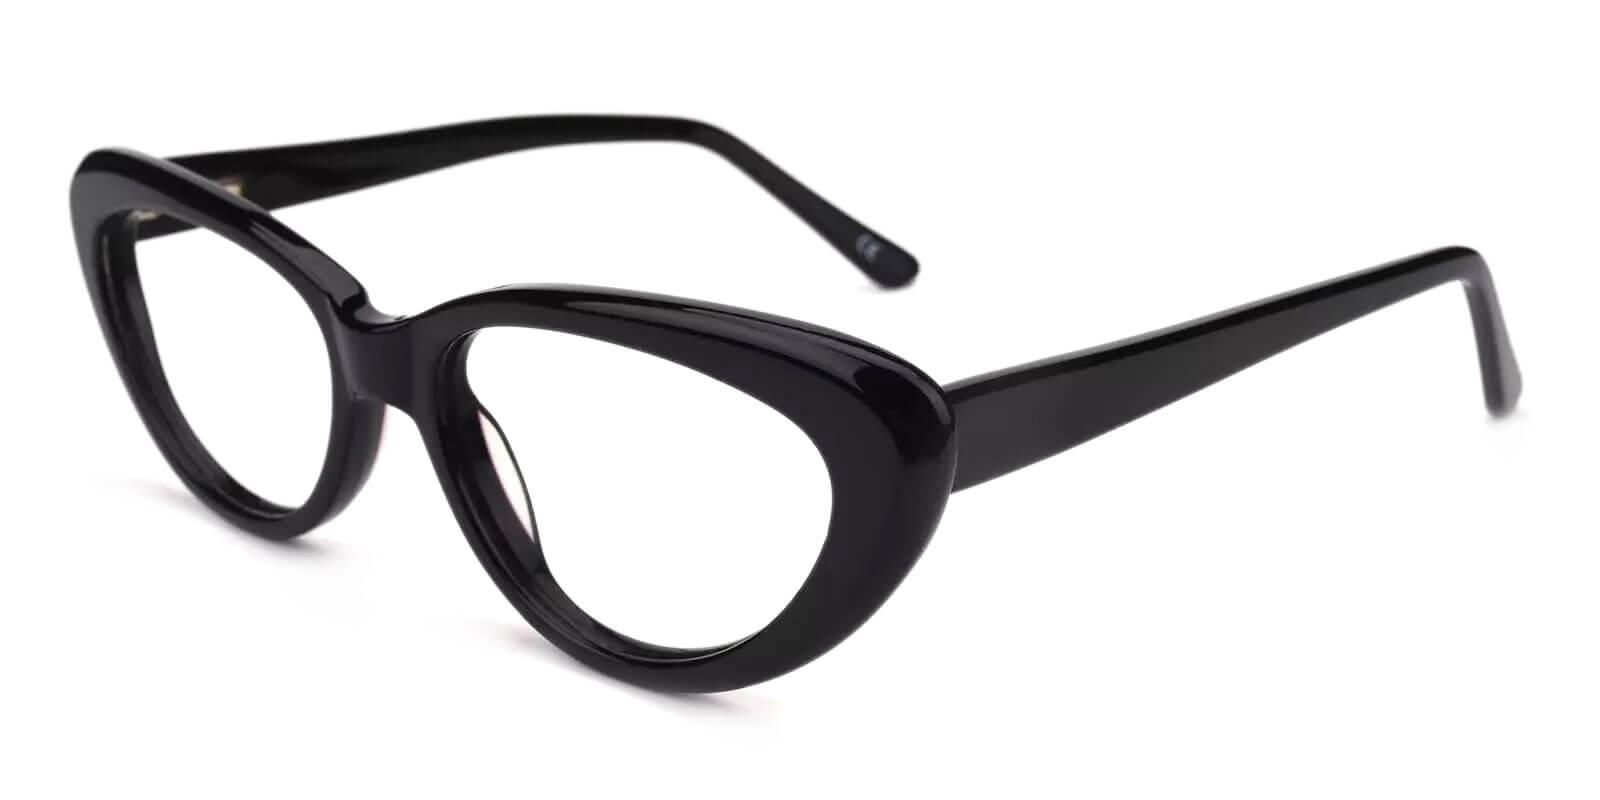 Stella Black Acetate Eyeglasses , SpringHinges , UniversalBridgeFit Frames from ABBE Glasses